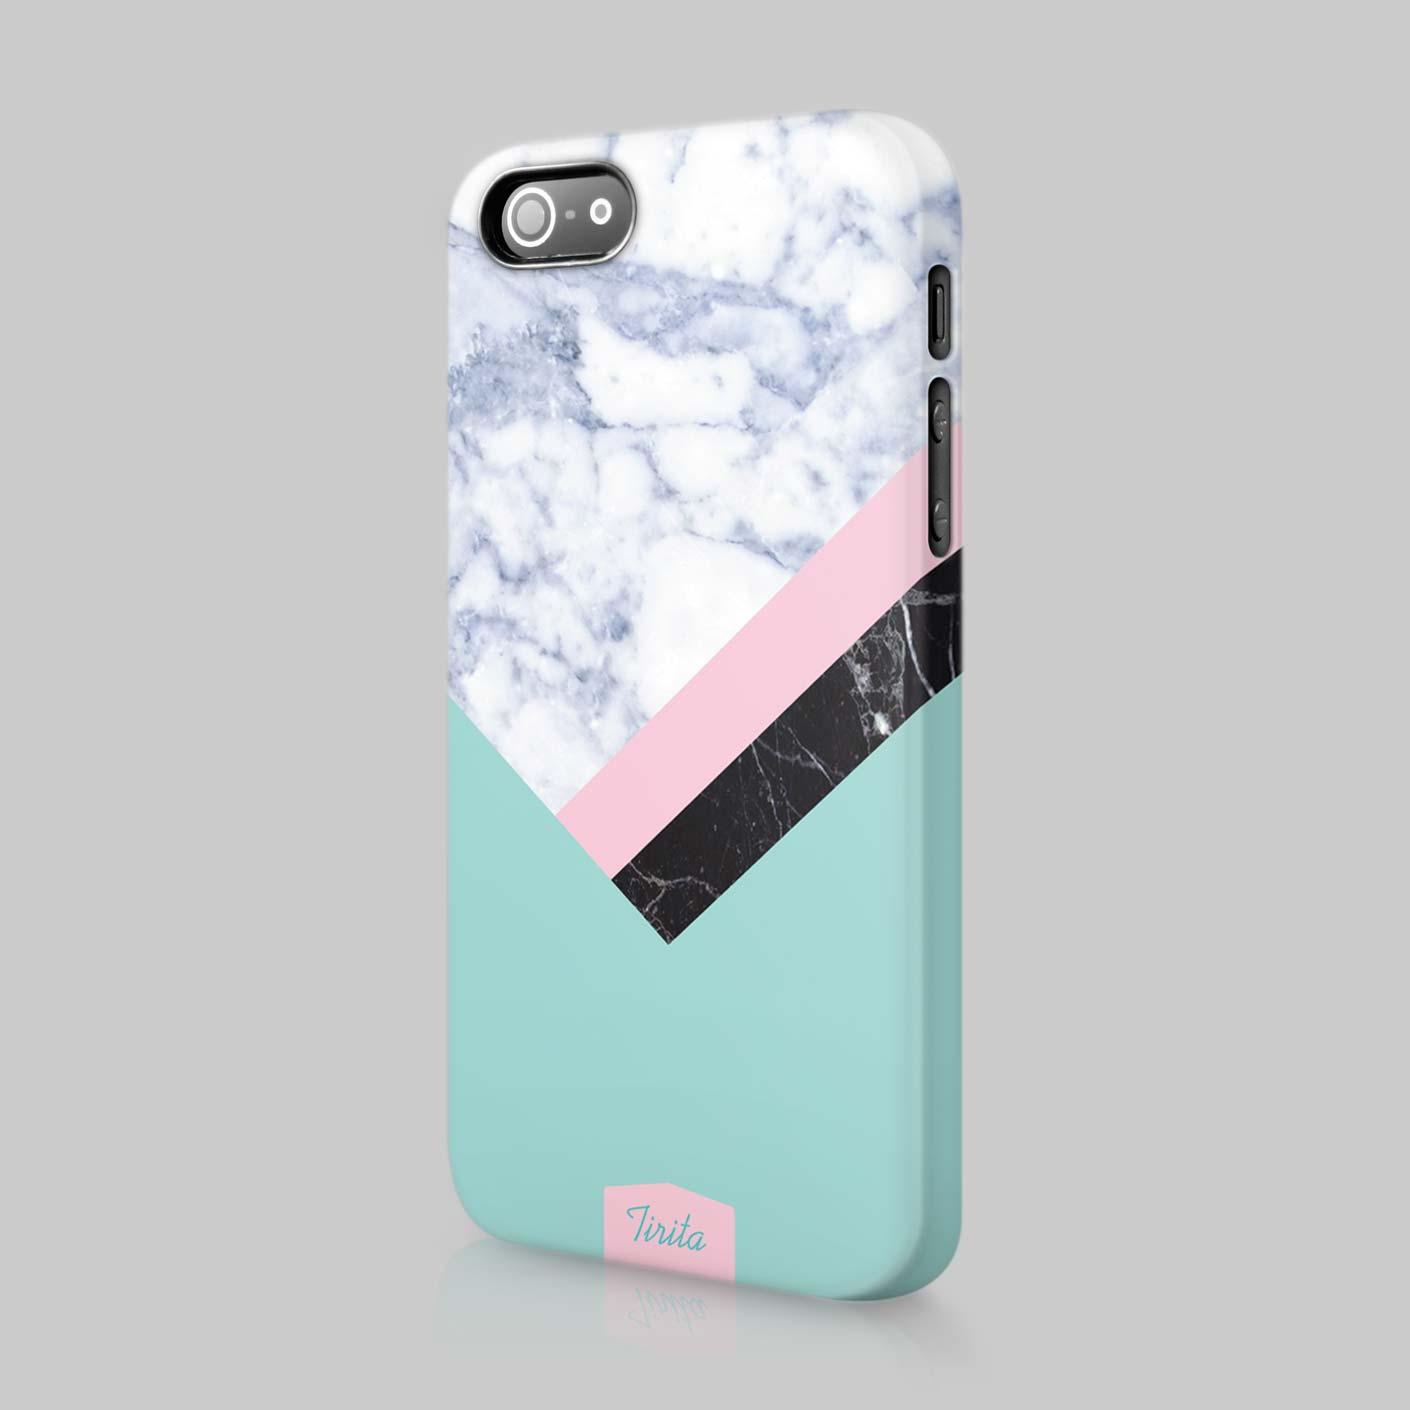 carcasa iphone 6 marmol